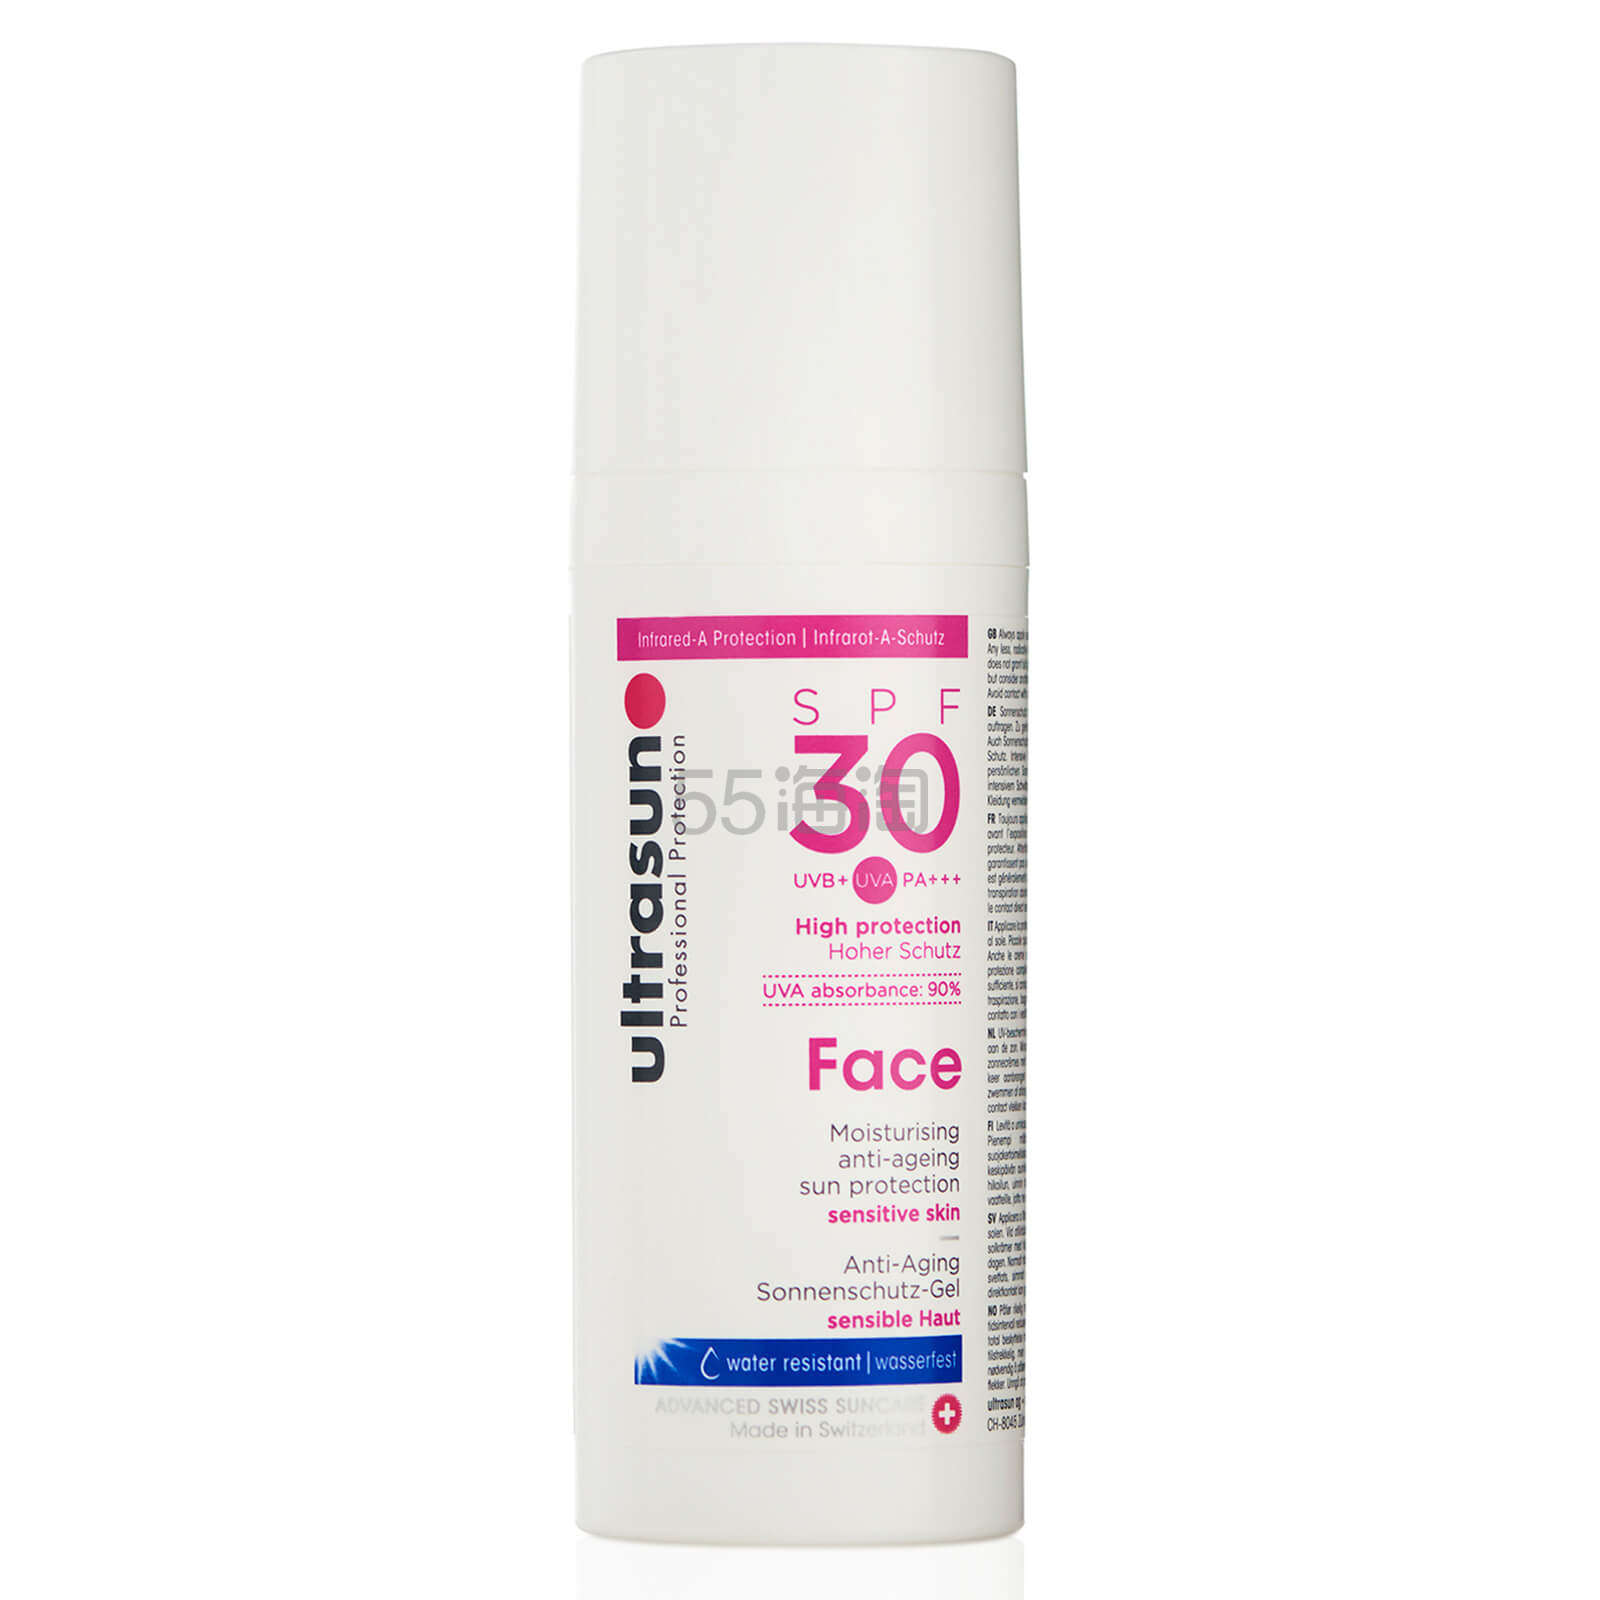 Ultrasun 面部防晒霜 SPF30 50ml £15.4(约132元) - 海淘优惠海淘折扣|55海淘网